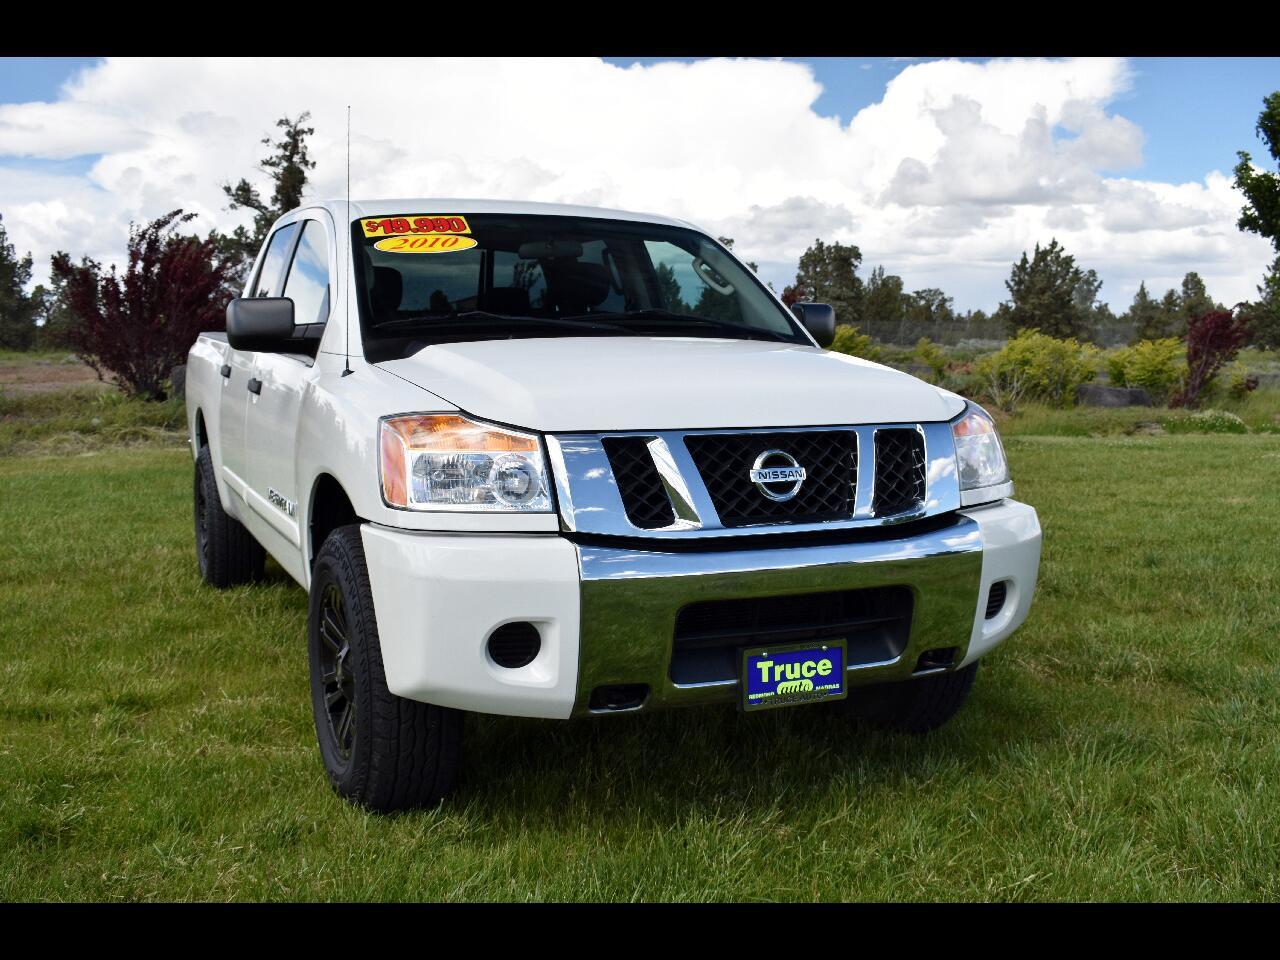 2010 Nissan Titan CREW CAB SWB SE **LOW MILES**